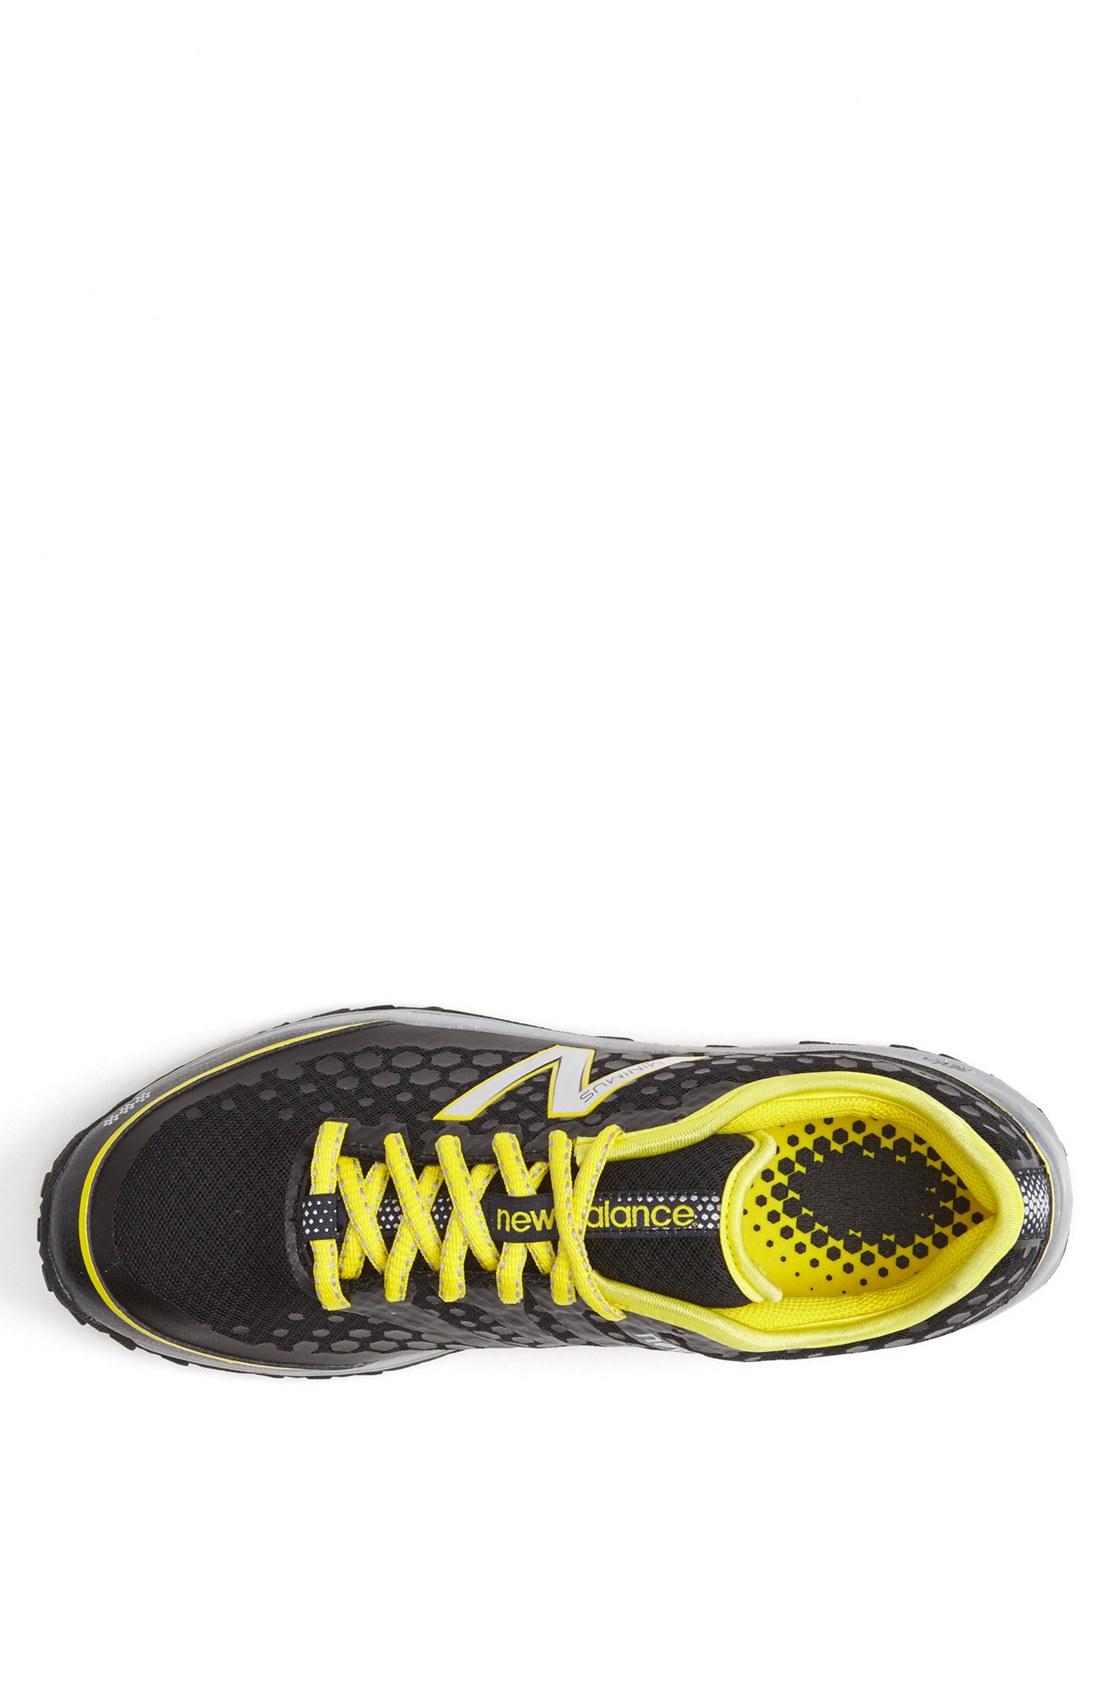 new balance minimus yellow and black